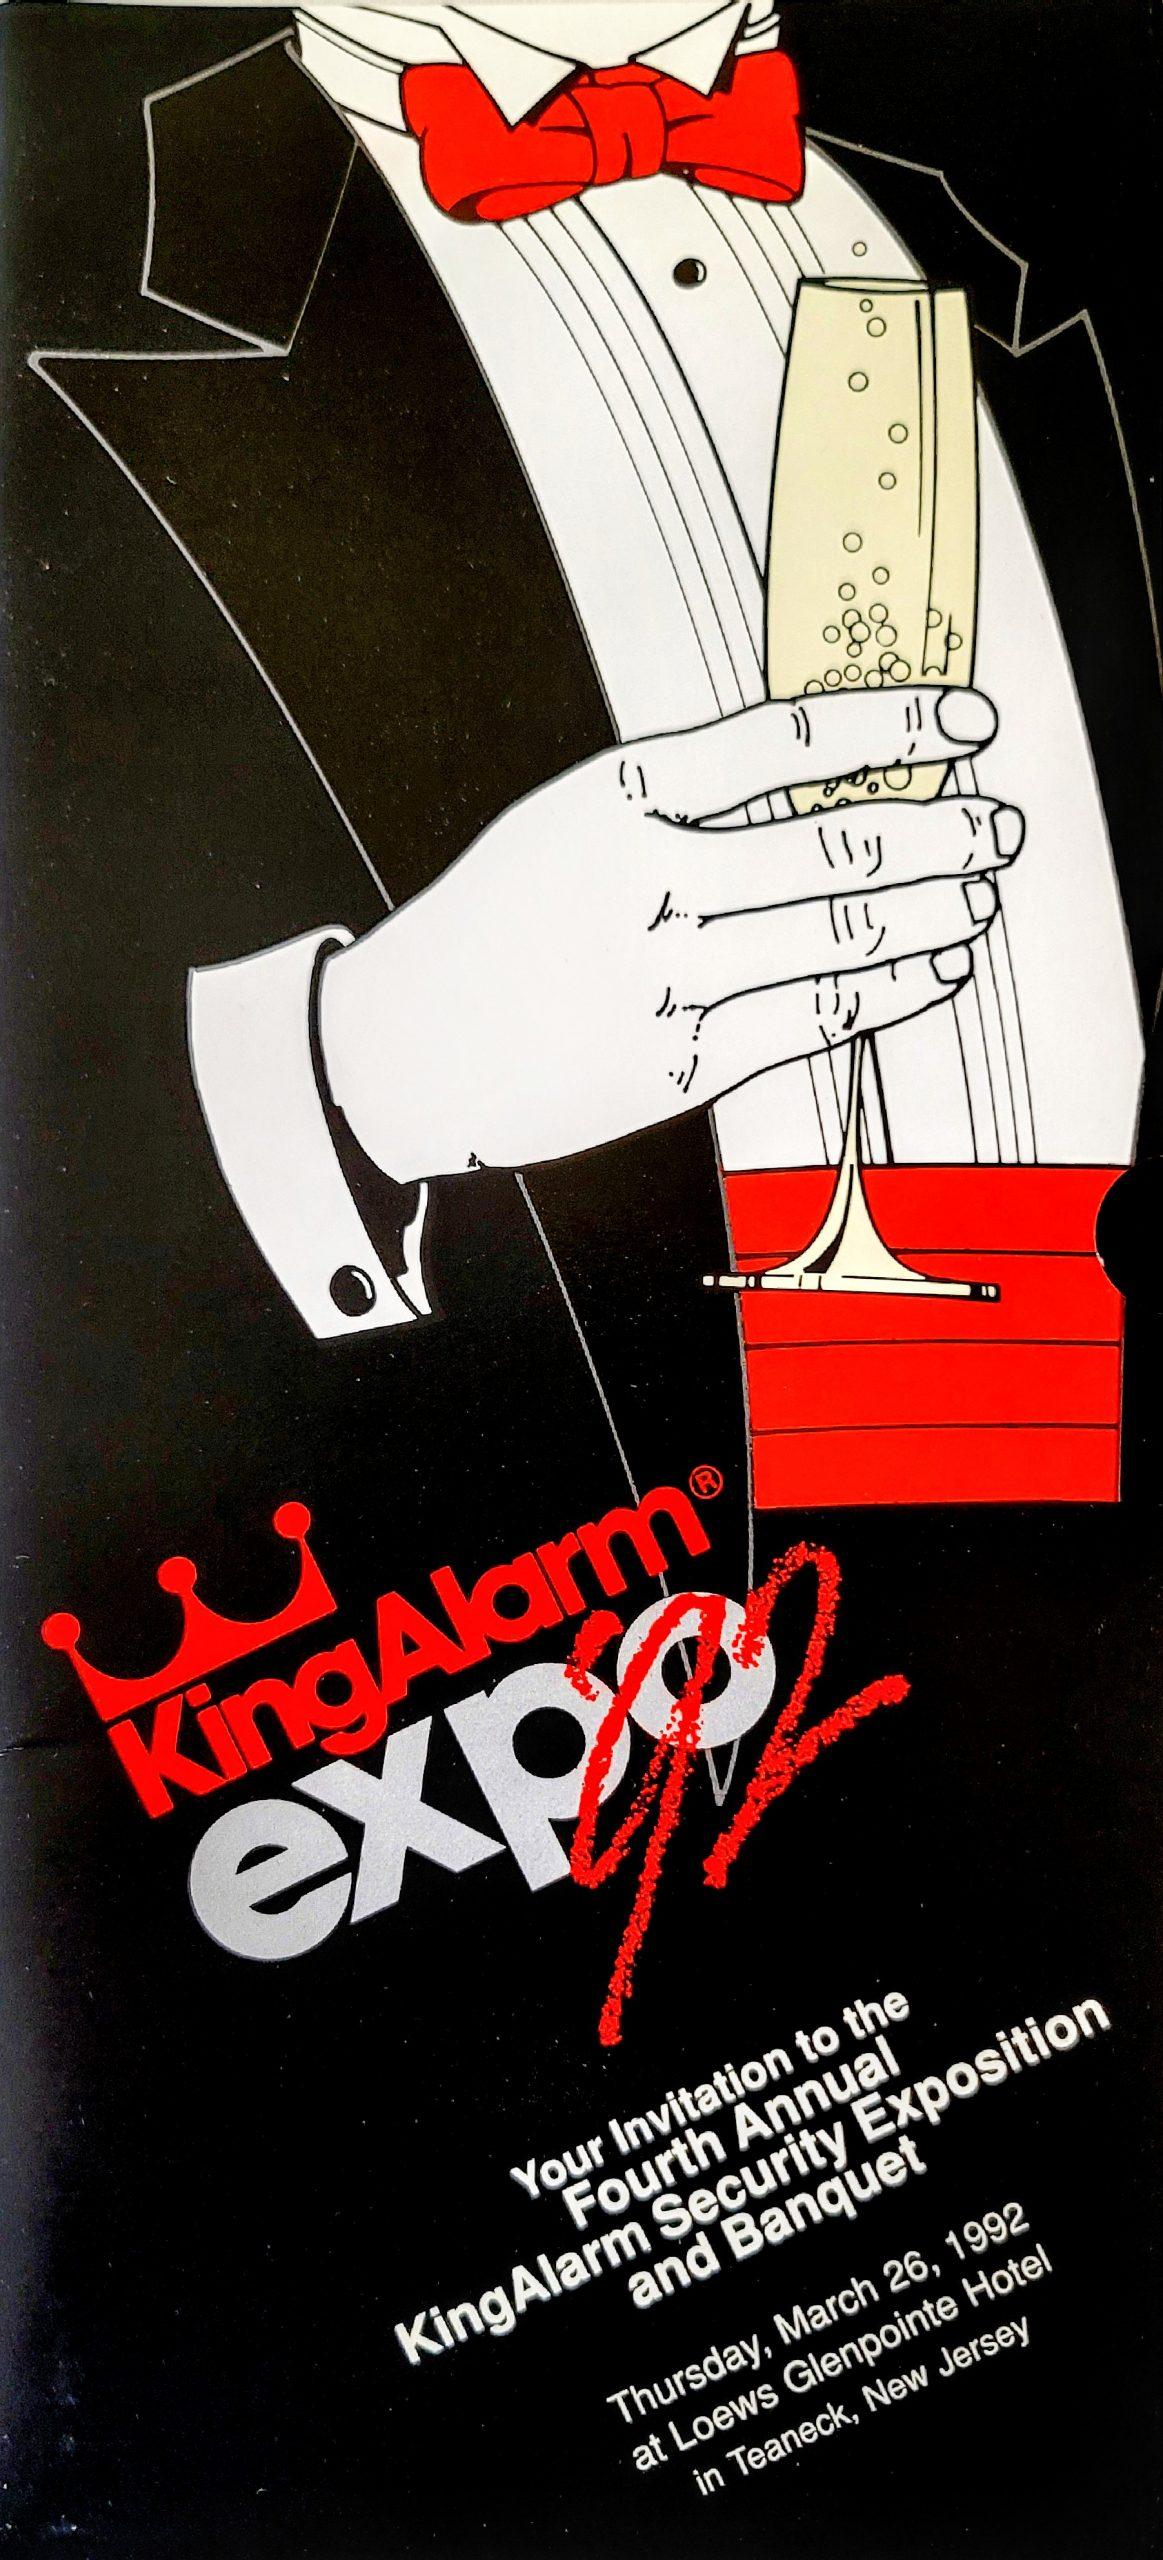 kingalarm_show invite_12